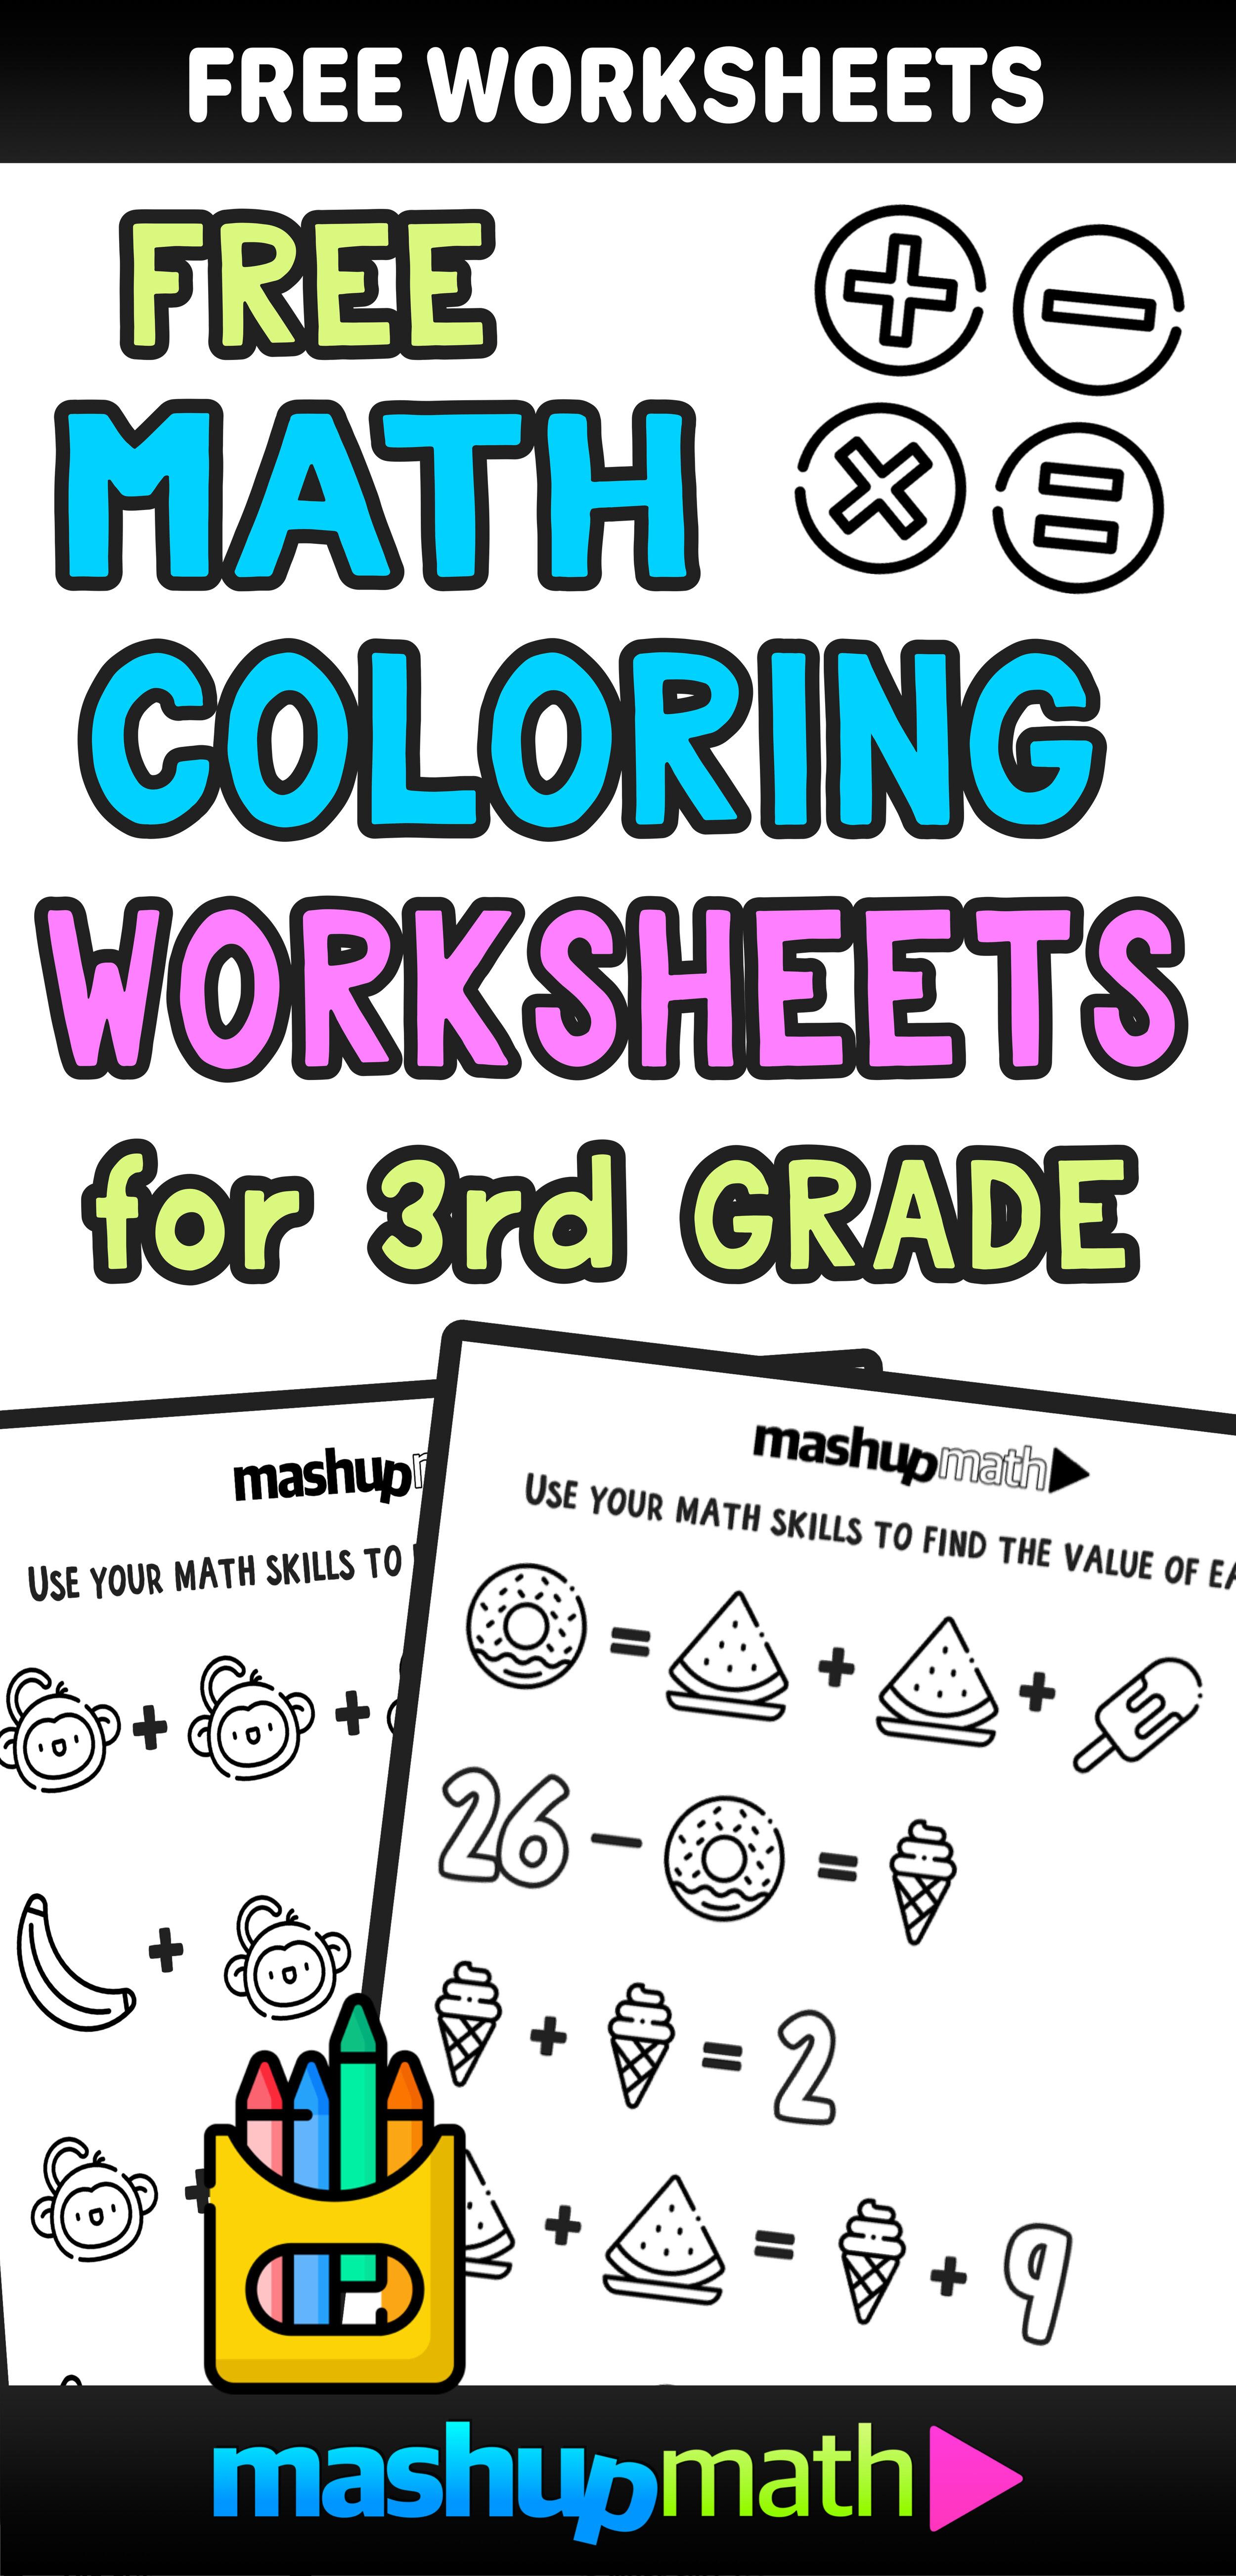 Free Math Coloring Worksheets For 3rd And 4th Grade Mashup Math